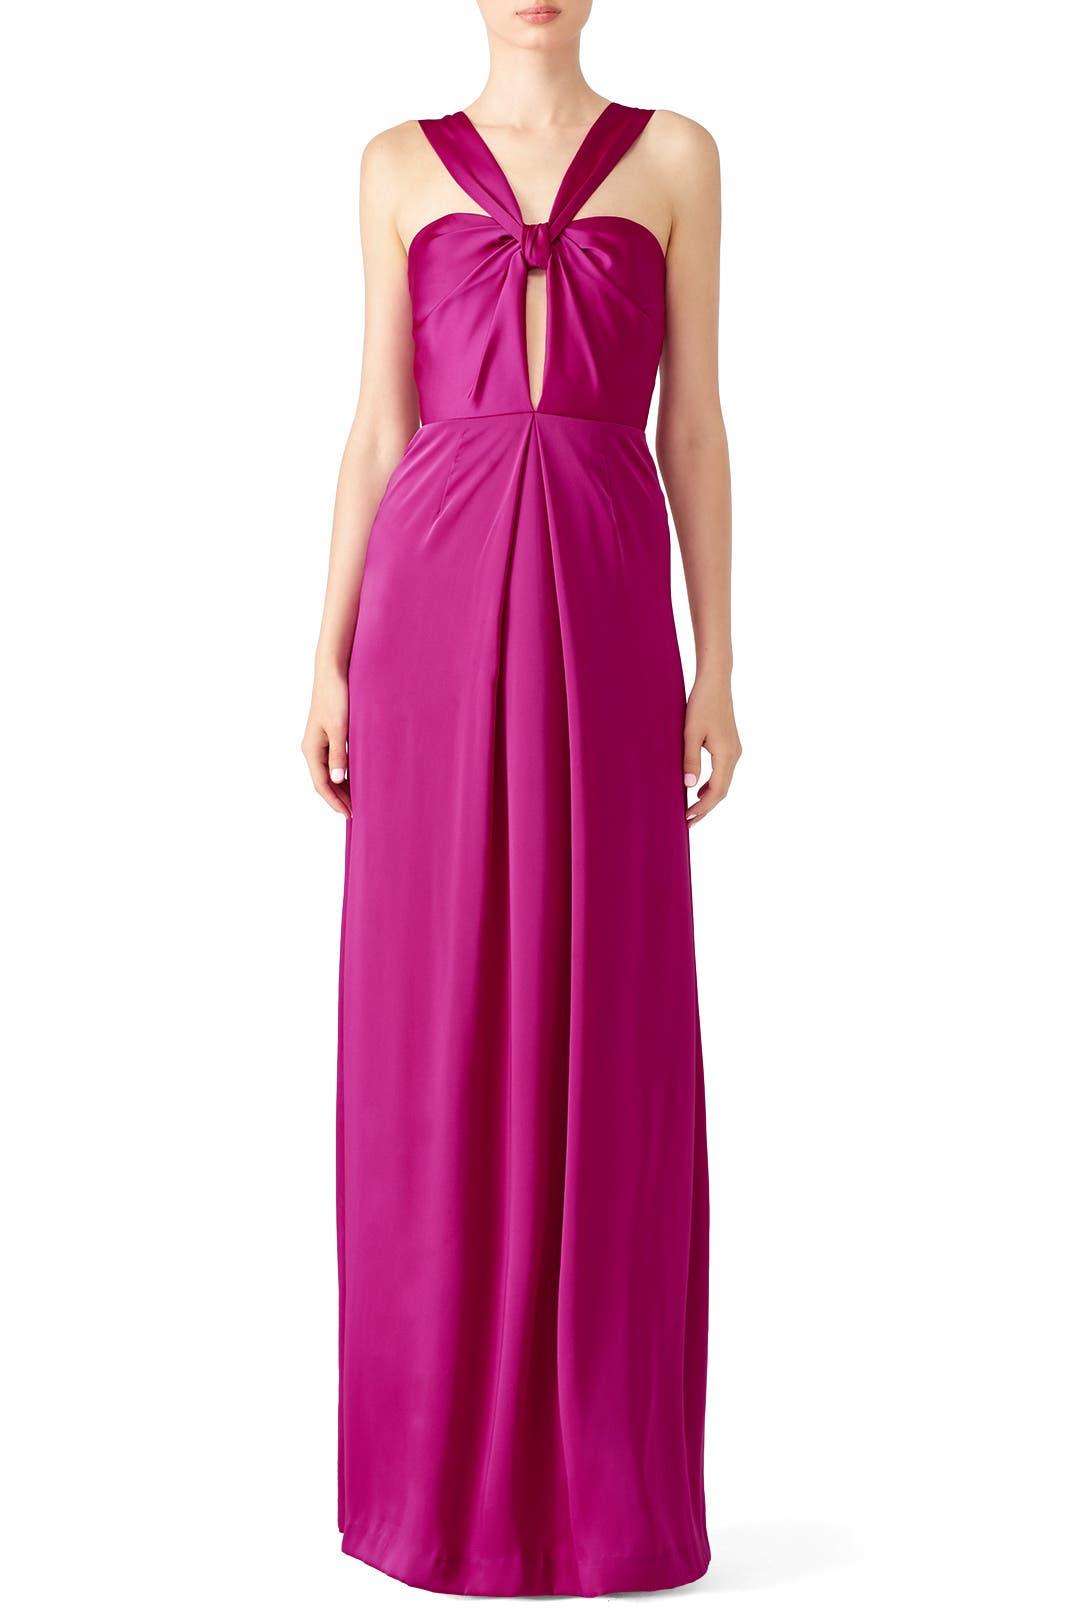 Viola Cutout Gown By Jill Jill Stuart For 70 80 Rent